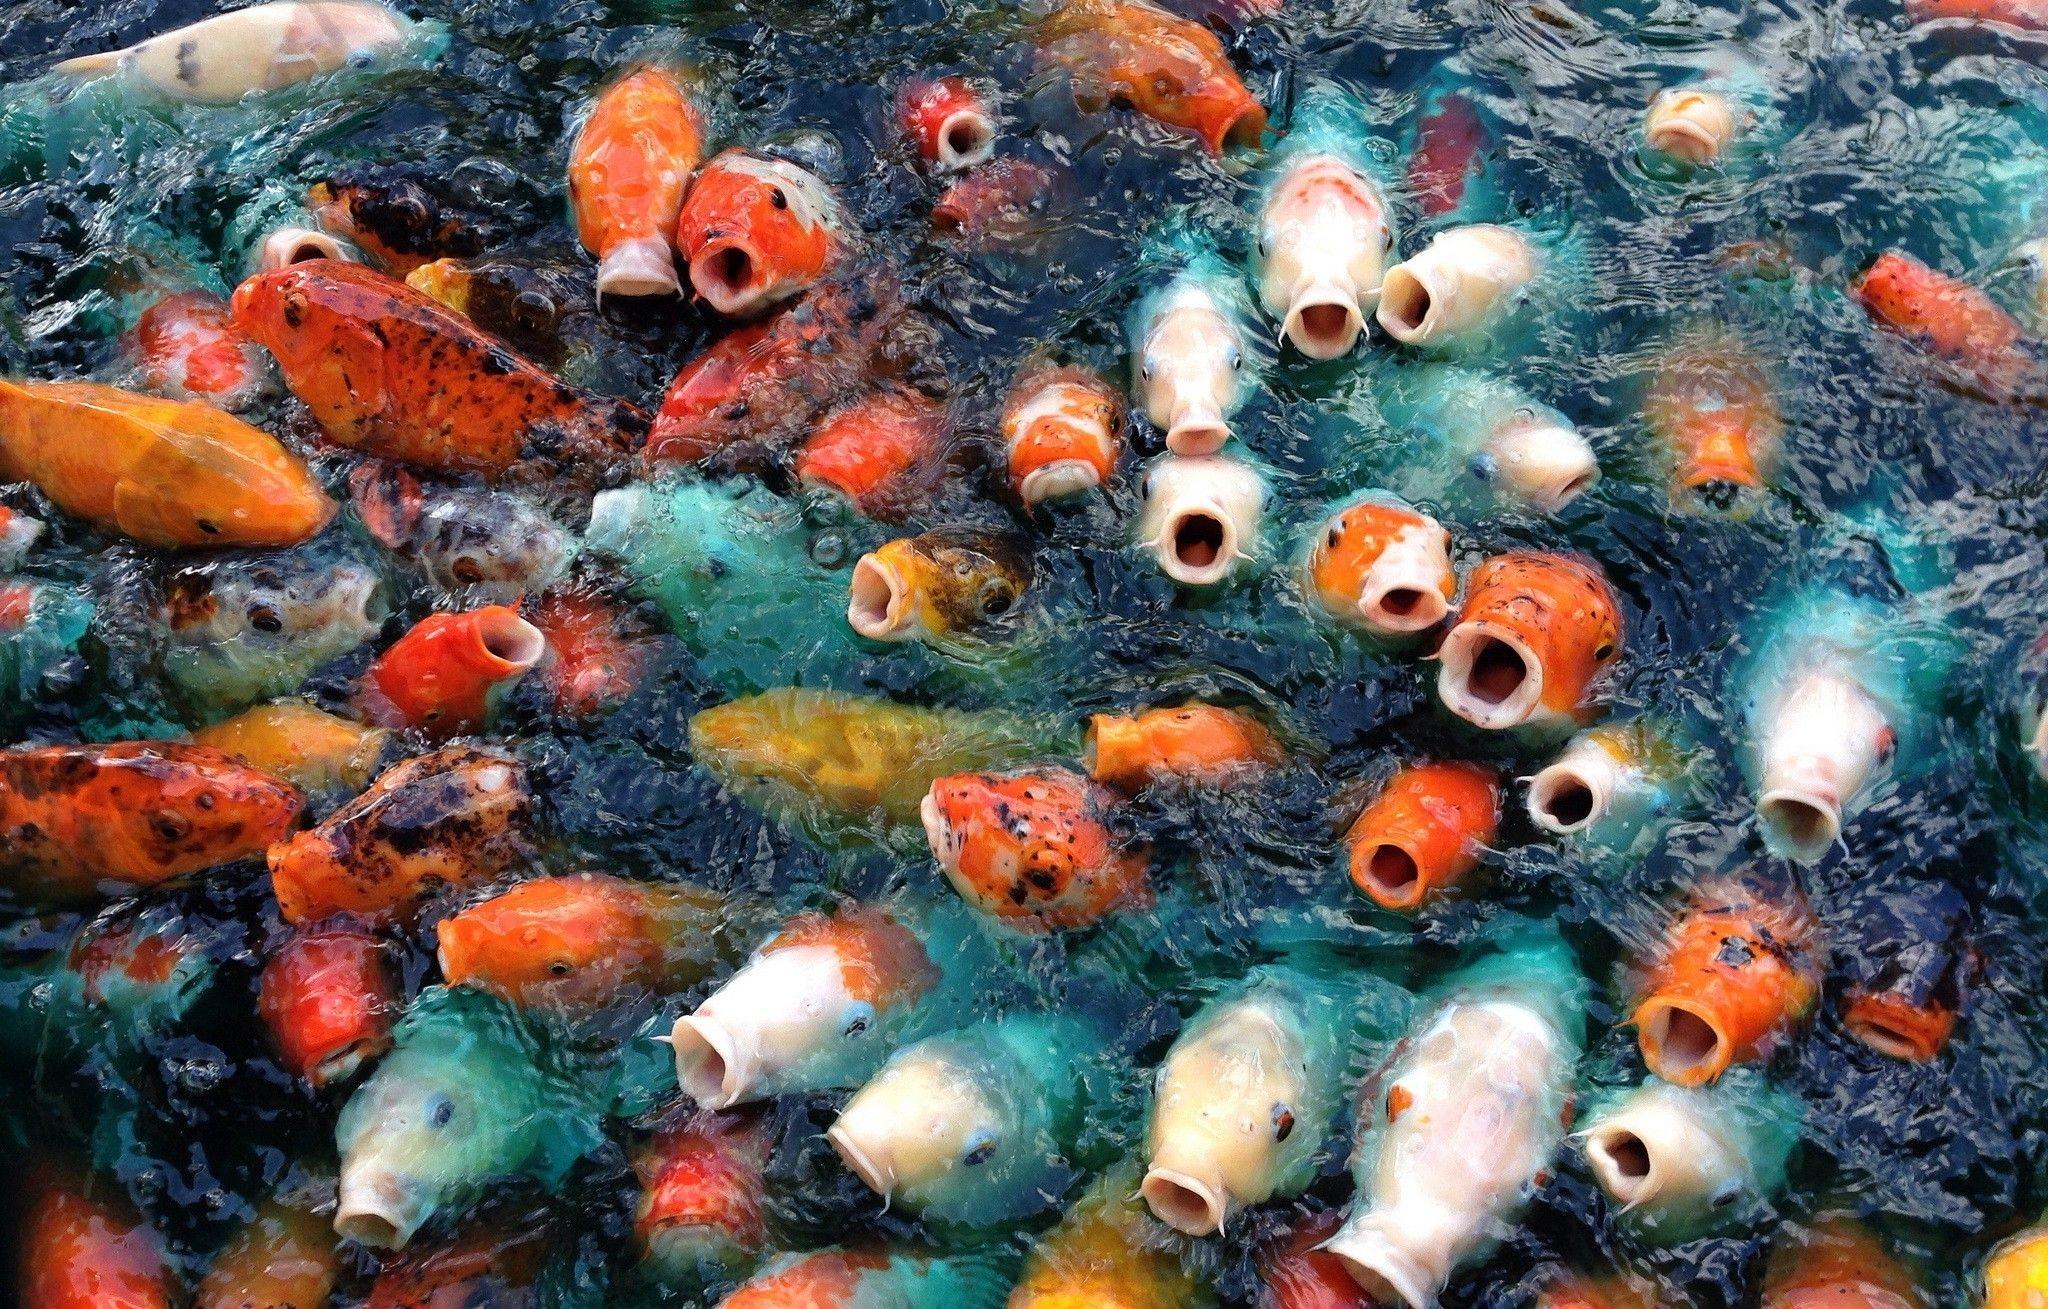 Koi Fish Wallpapers (64+ images)